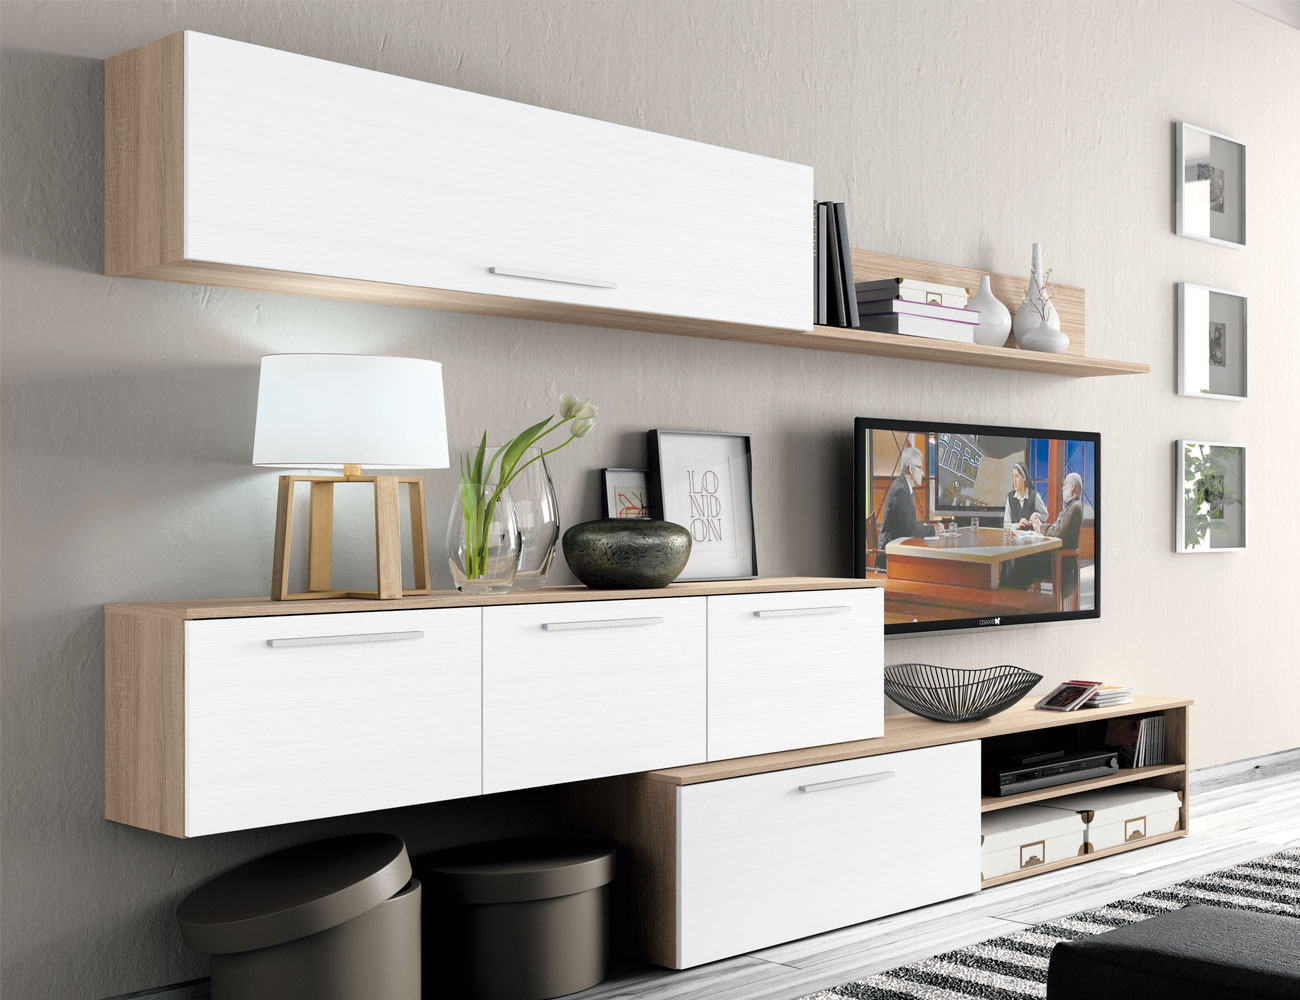 Mueble salon moderno cambrian blanco2